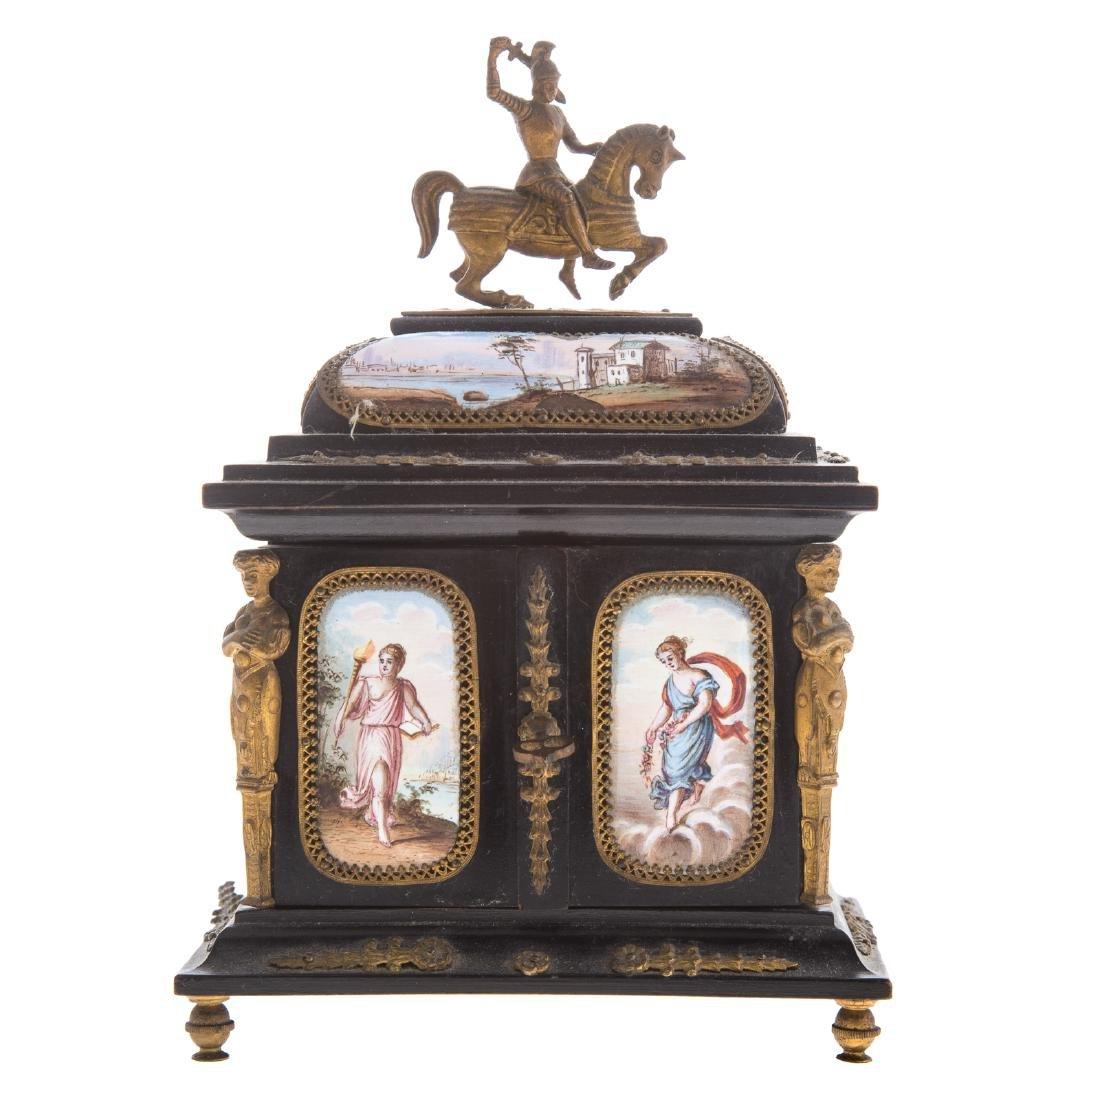 Italian ebonized wood and enamel jewelry box